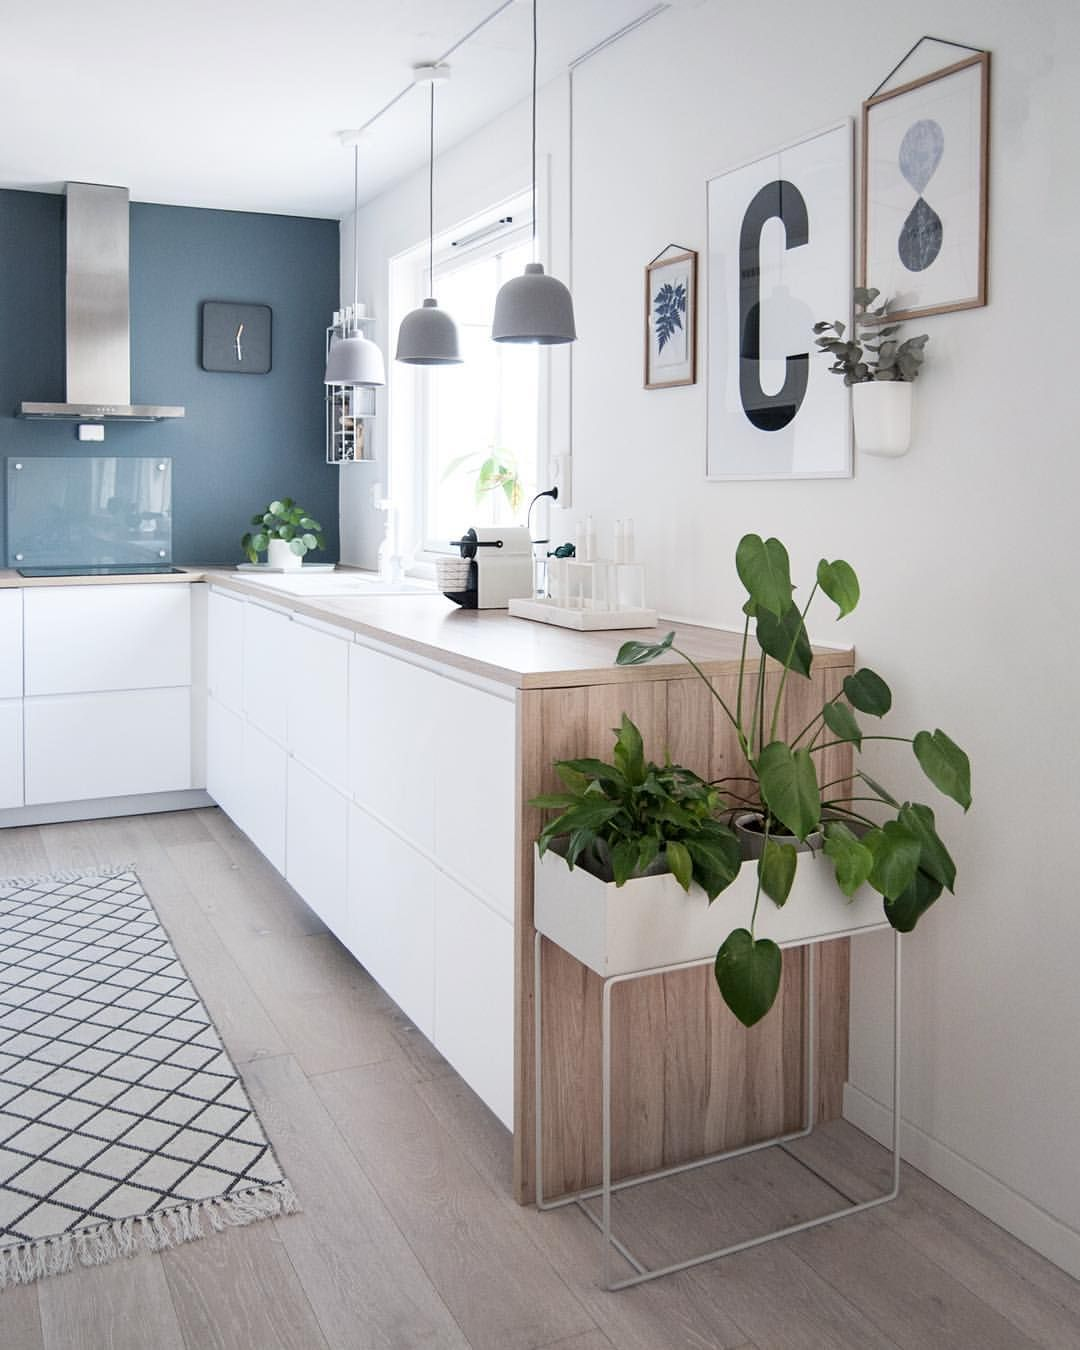 This plant box! . #boligpluss #interior123 #interior4all #interiorforyou #bobedre #boligplussminstil #interiørmagasinet #room123 #roomforinspo #immyandindi #nordiskehjem #inspirasjonsguidennorge #myinterior #passion4interior #stpaulsblue #jotunlady #kitcheninspo #kitchendetails #kitchencounter #plantbox #fermliving #monstera #enkontrast #muuto #grainpendant #voxtorp #ikeavoxtorp #moebeframe #normanncopenhagen #pocketorganizer